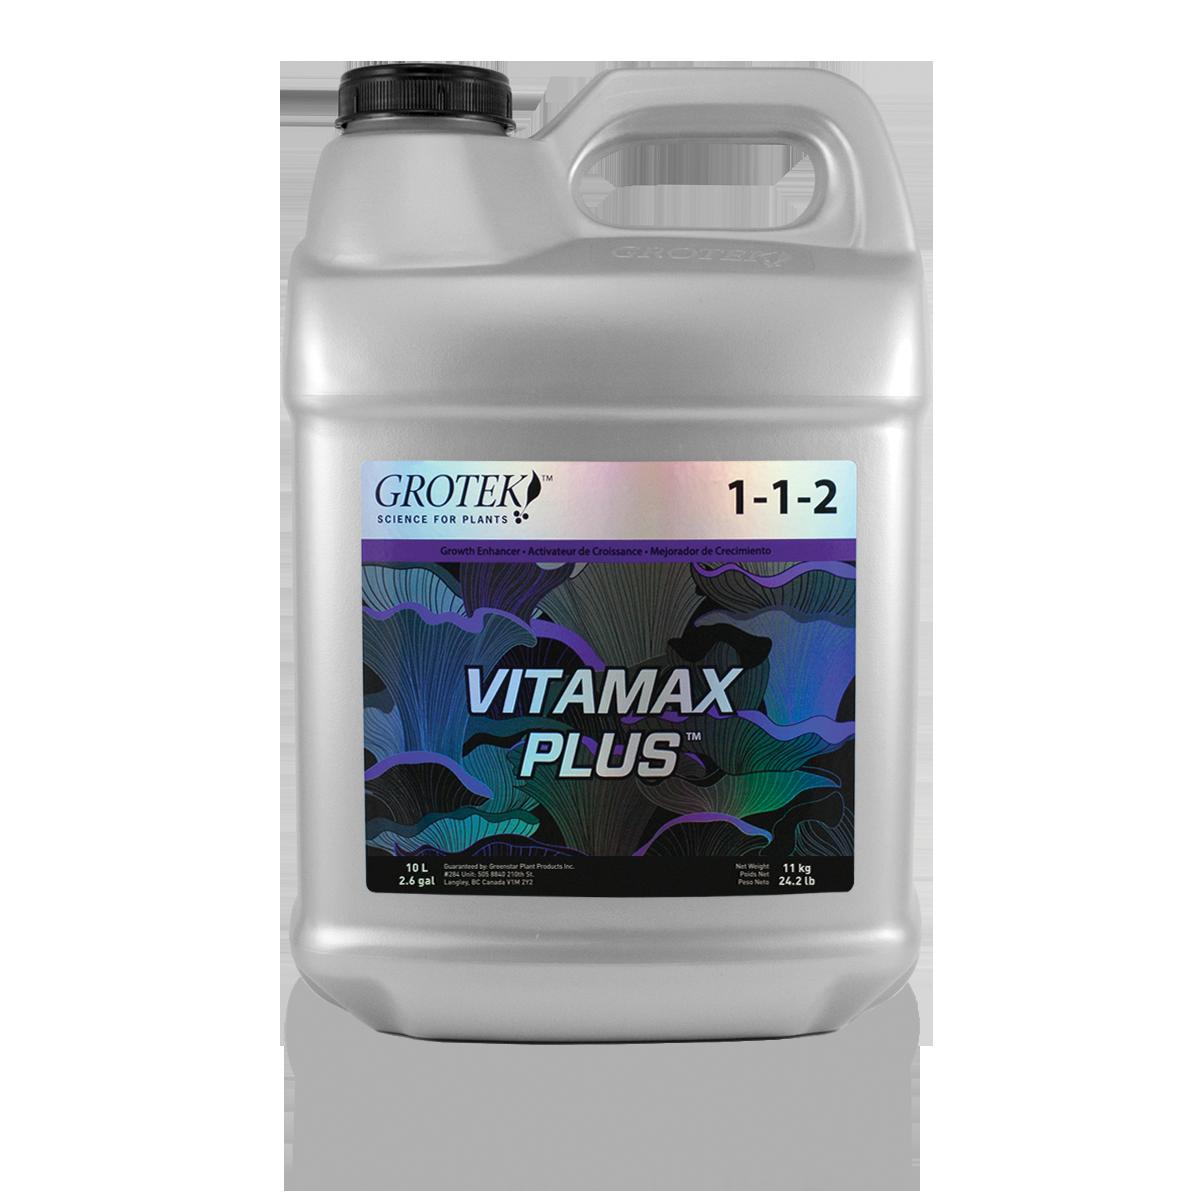 Grotek Grotek - Vitamax Plus